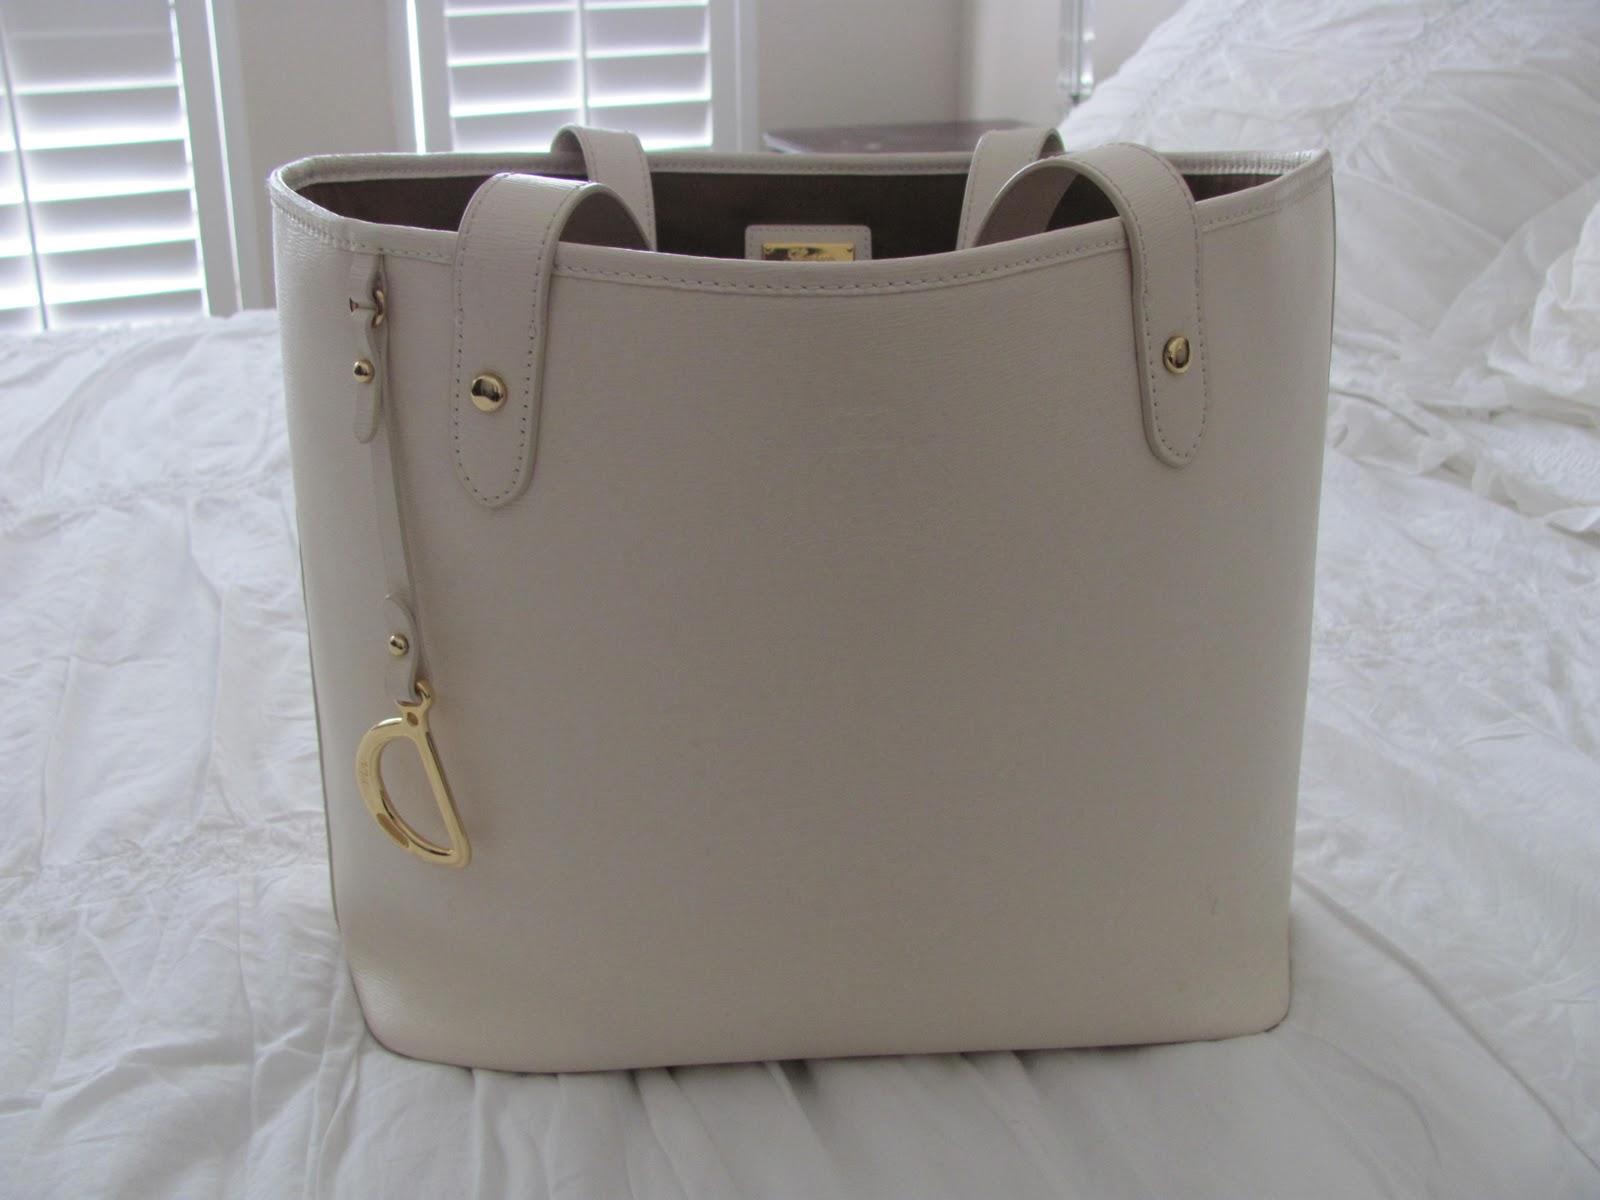 Mn Sue Women Top Handle Satchel Leather Handbag Shoulder Bag Lady Tote Purse  with Strap 15cc87ee6a506